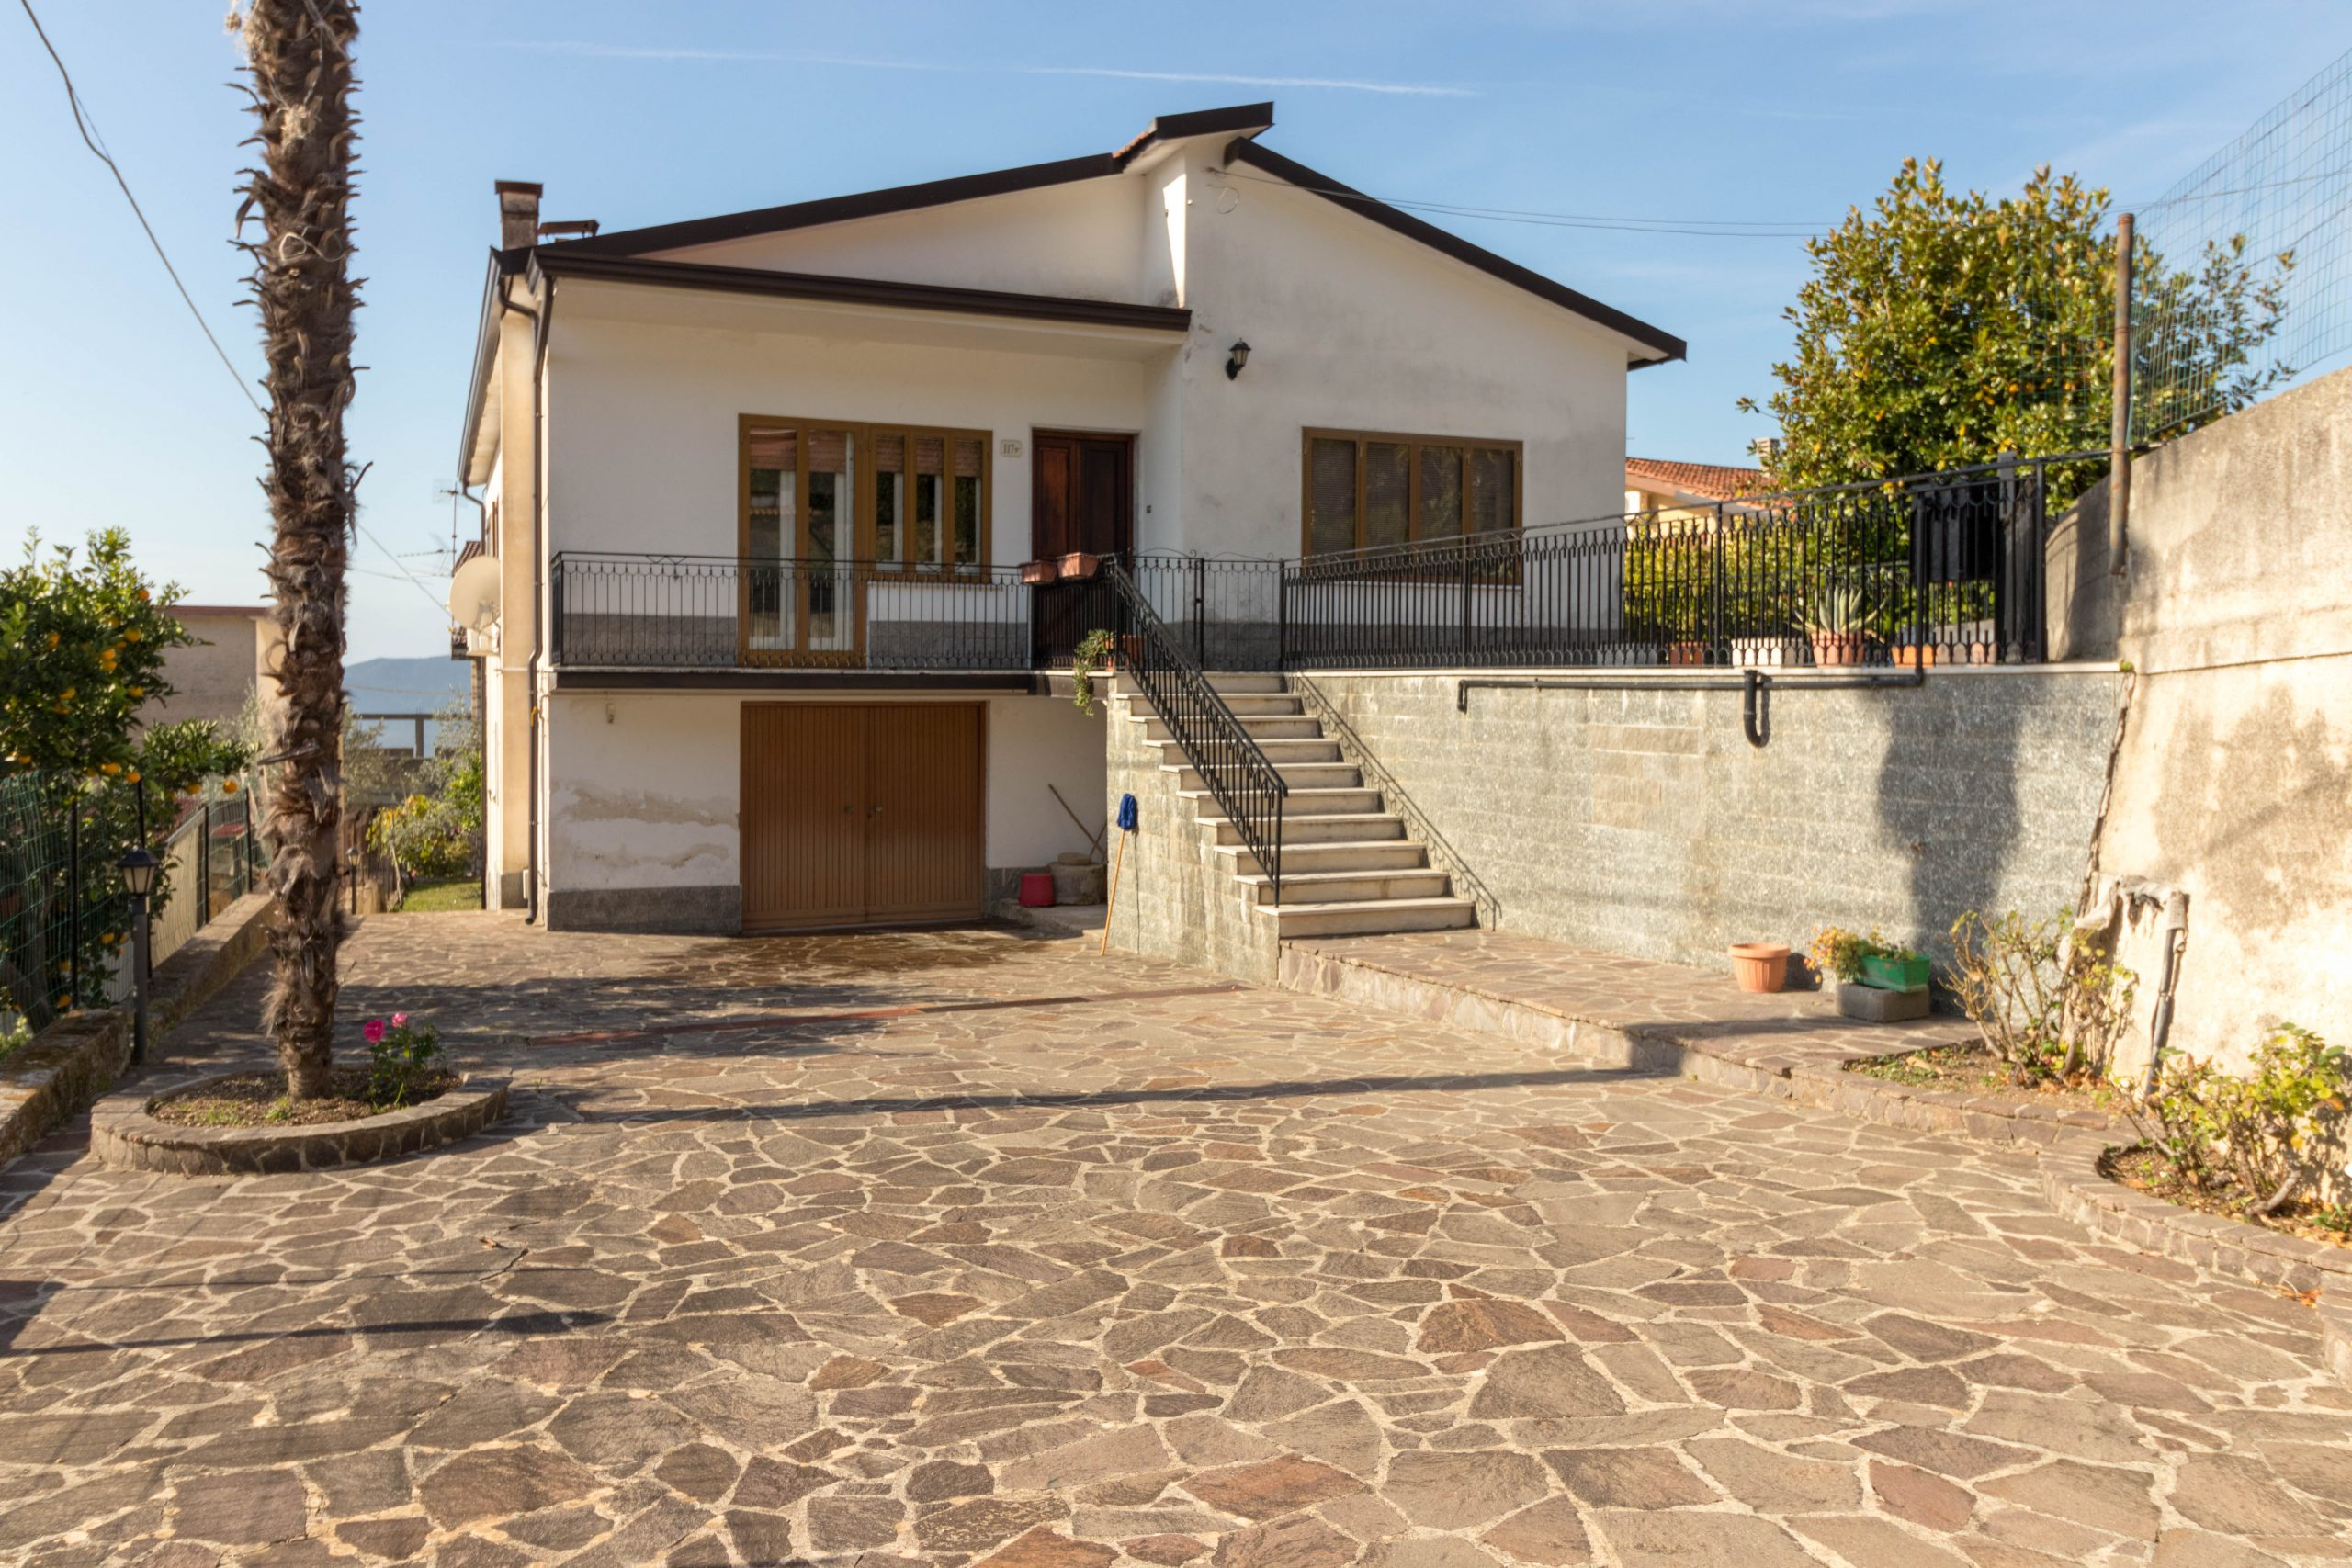 Casa in vendita A Sant' Angelo d'alife